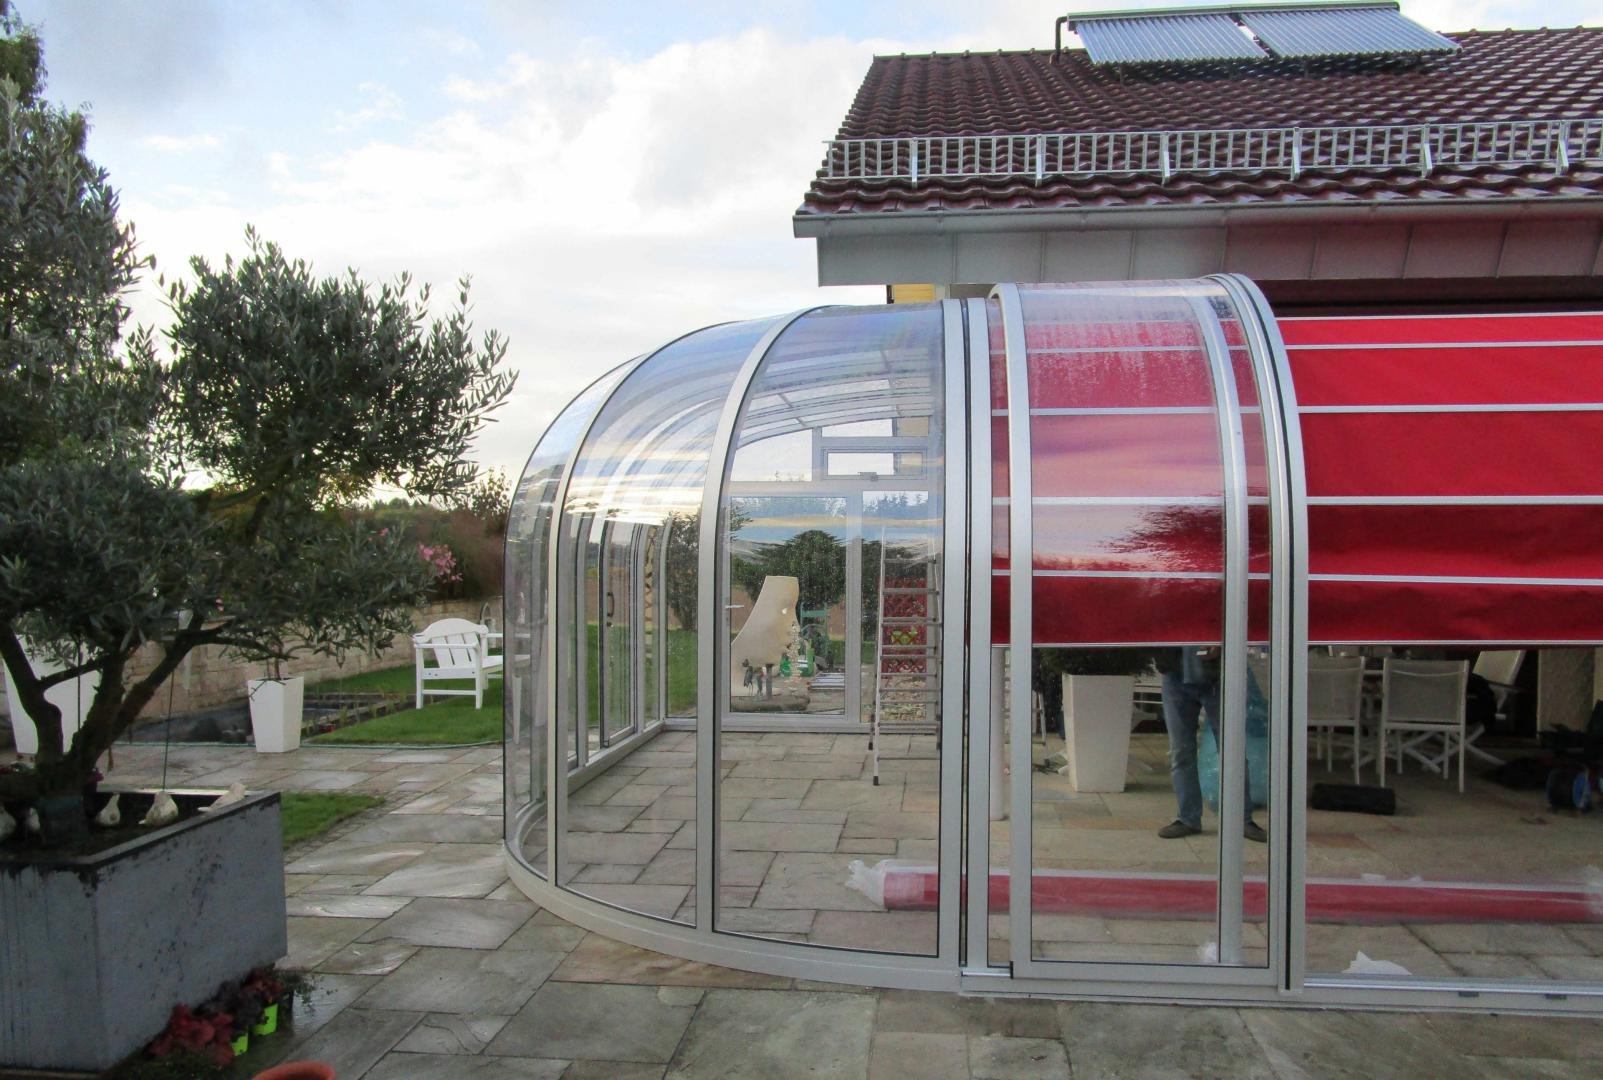 Abri terrasse perle solar v randa bioclimatique - Veranda arrondie ...